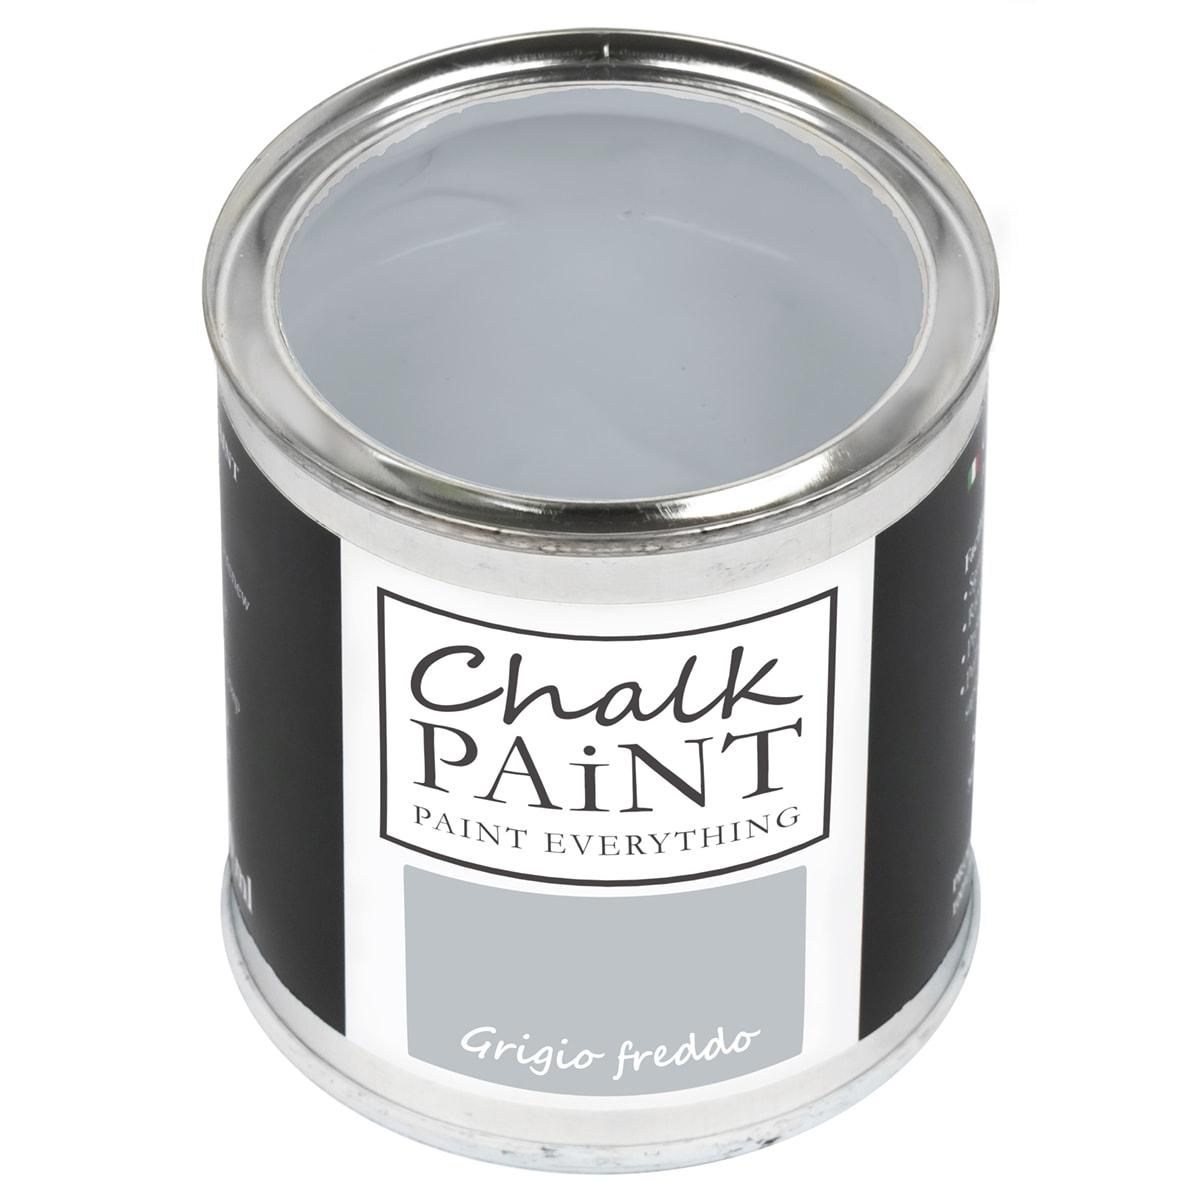 Chalk Paint Grigio freddo